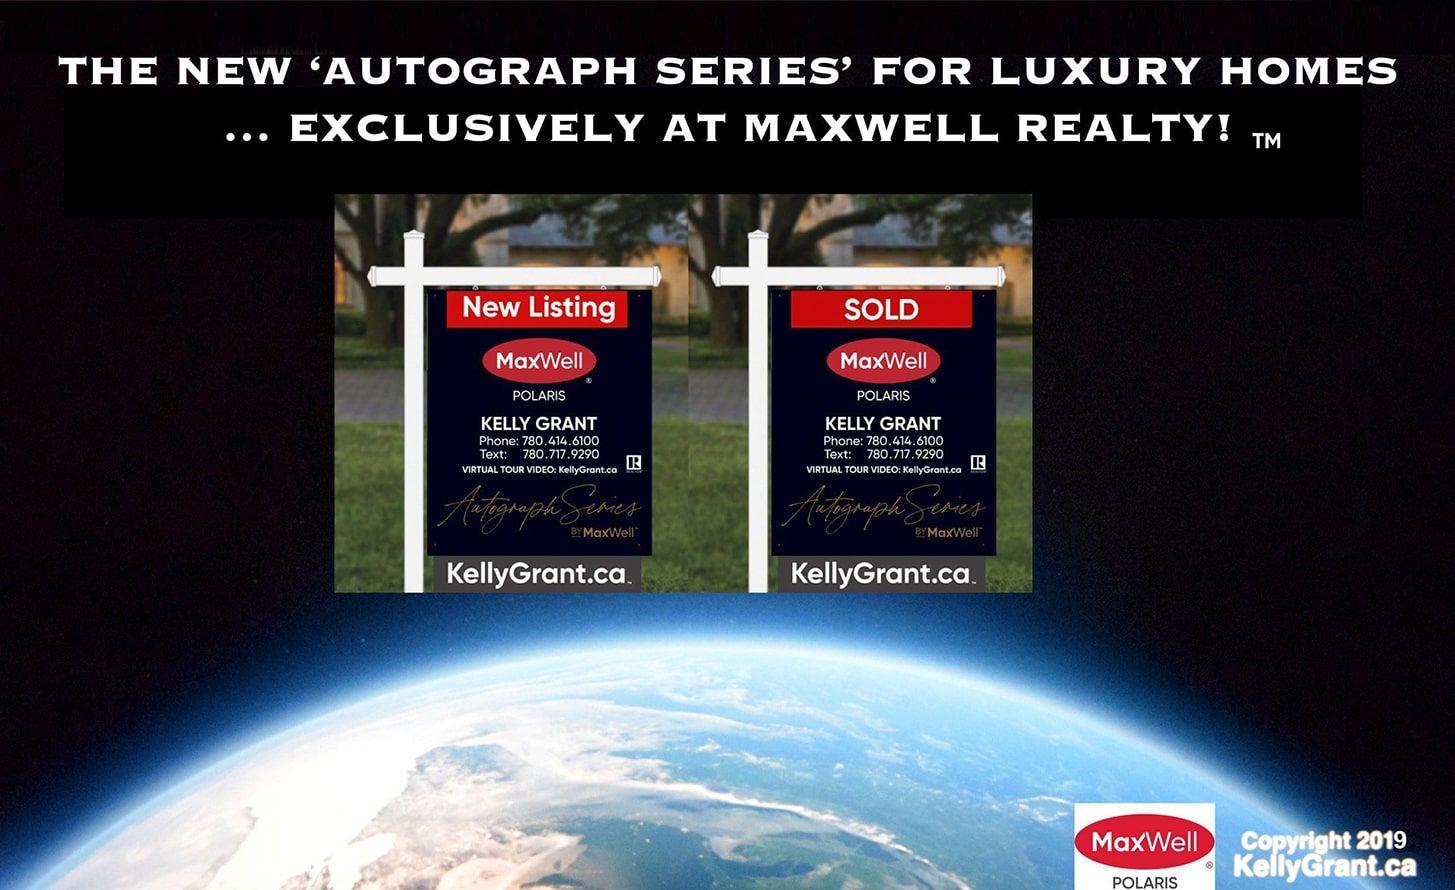 #5-KG MaxWell Autograph Series.jpg